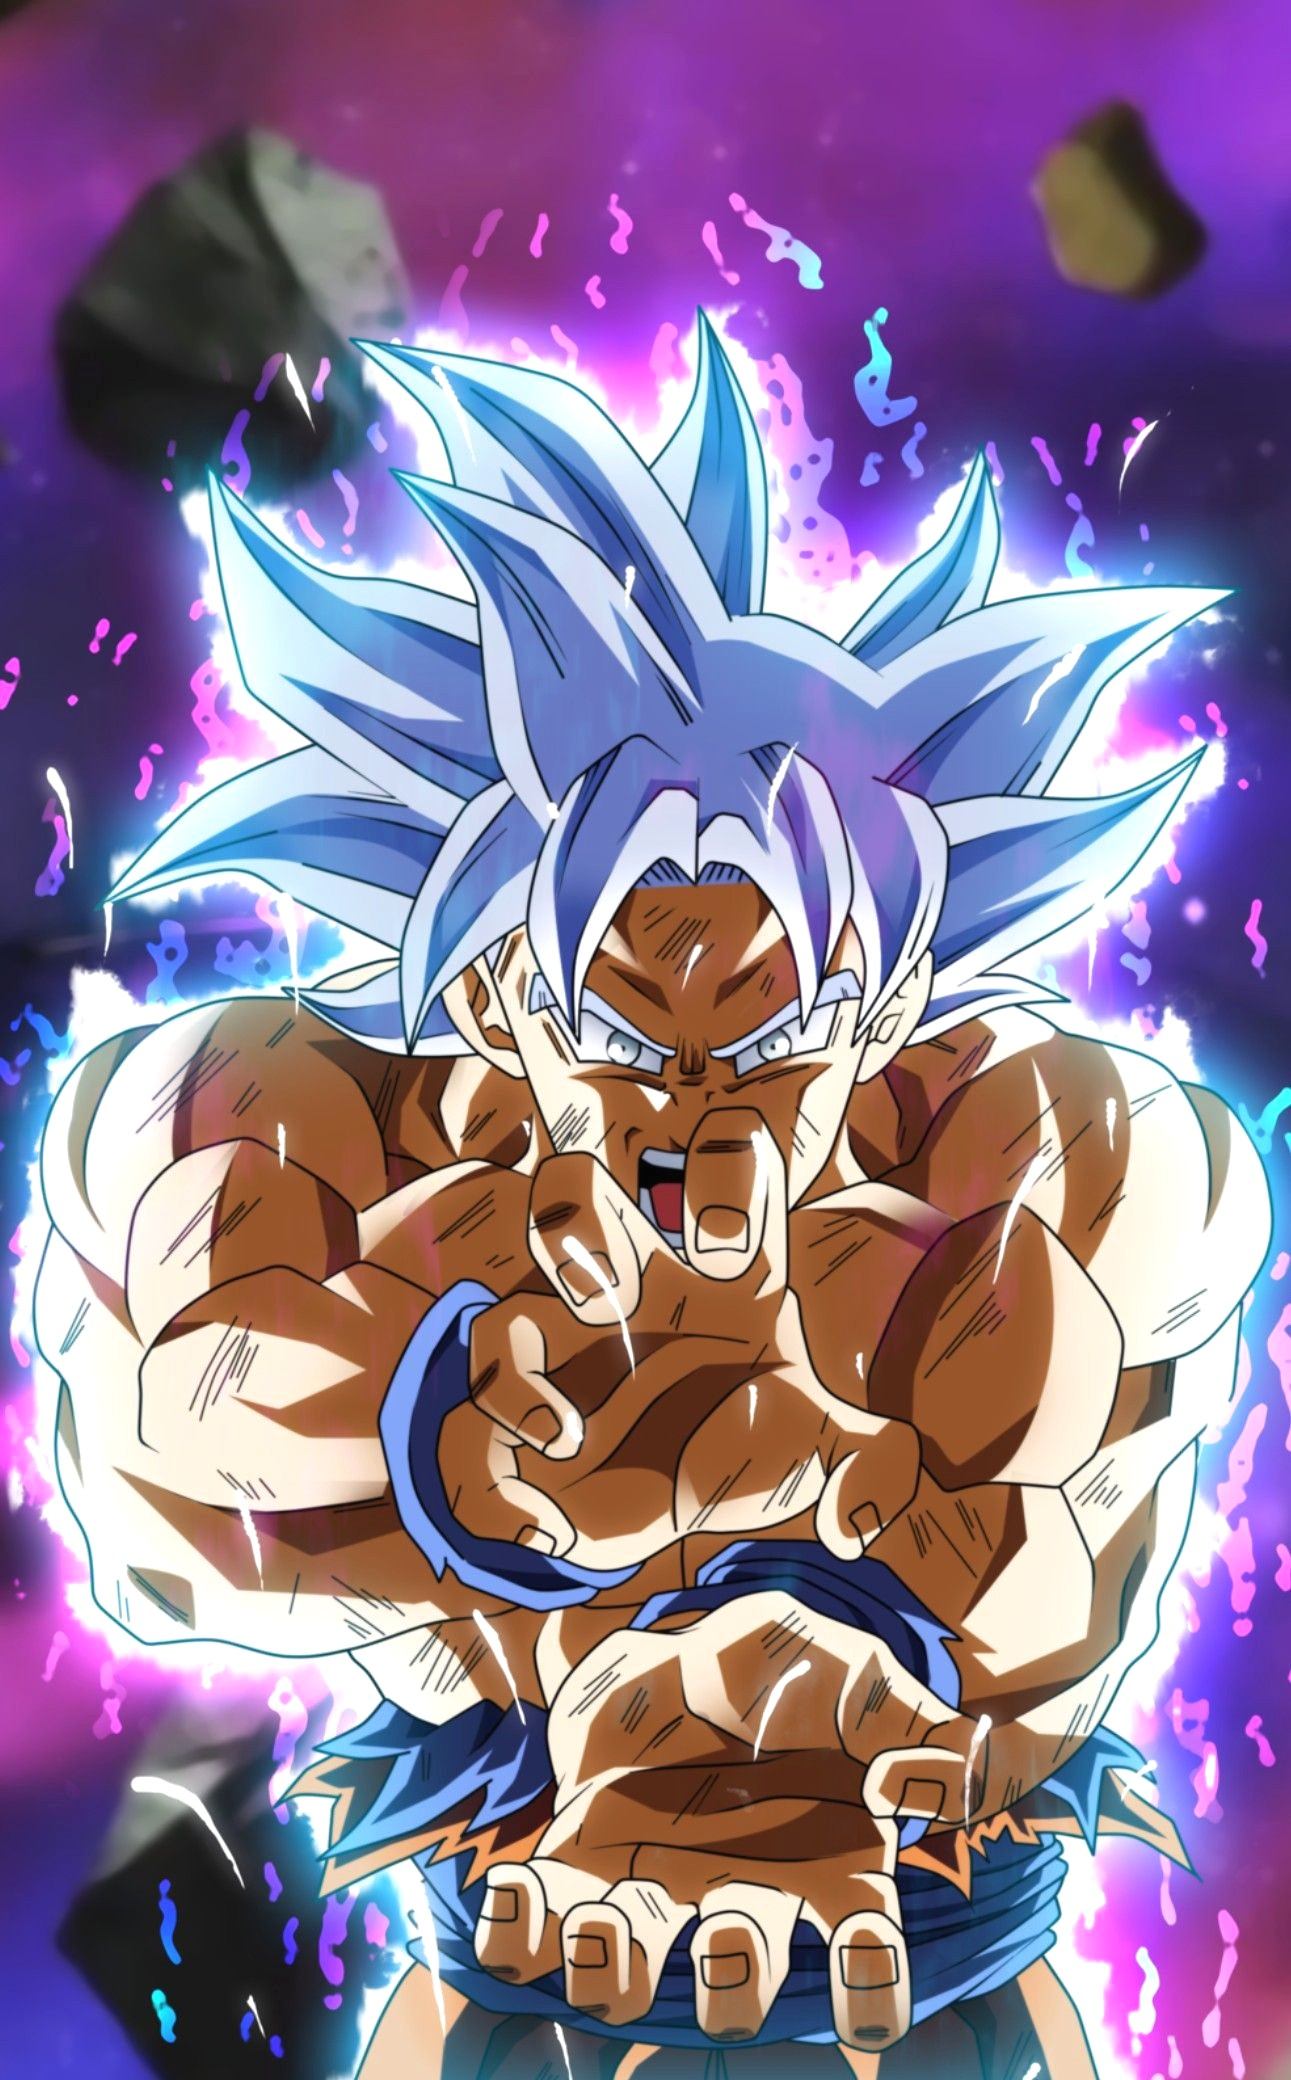 Goku Ultra Instinct Dragon Ball Super Wallpaper Animated Goku Silver Ultra Instinct 1291x2080 Download Hd Wallpaper Wallpapertip